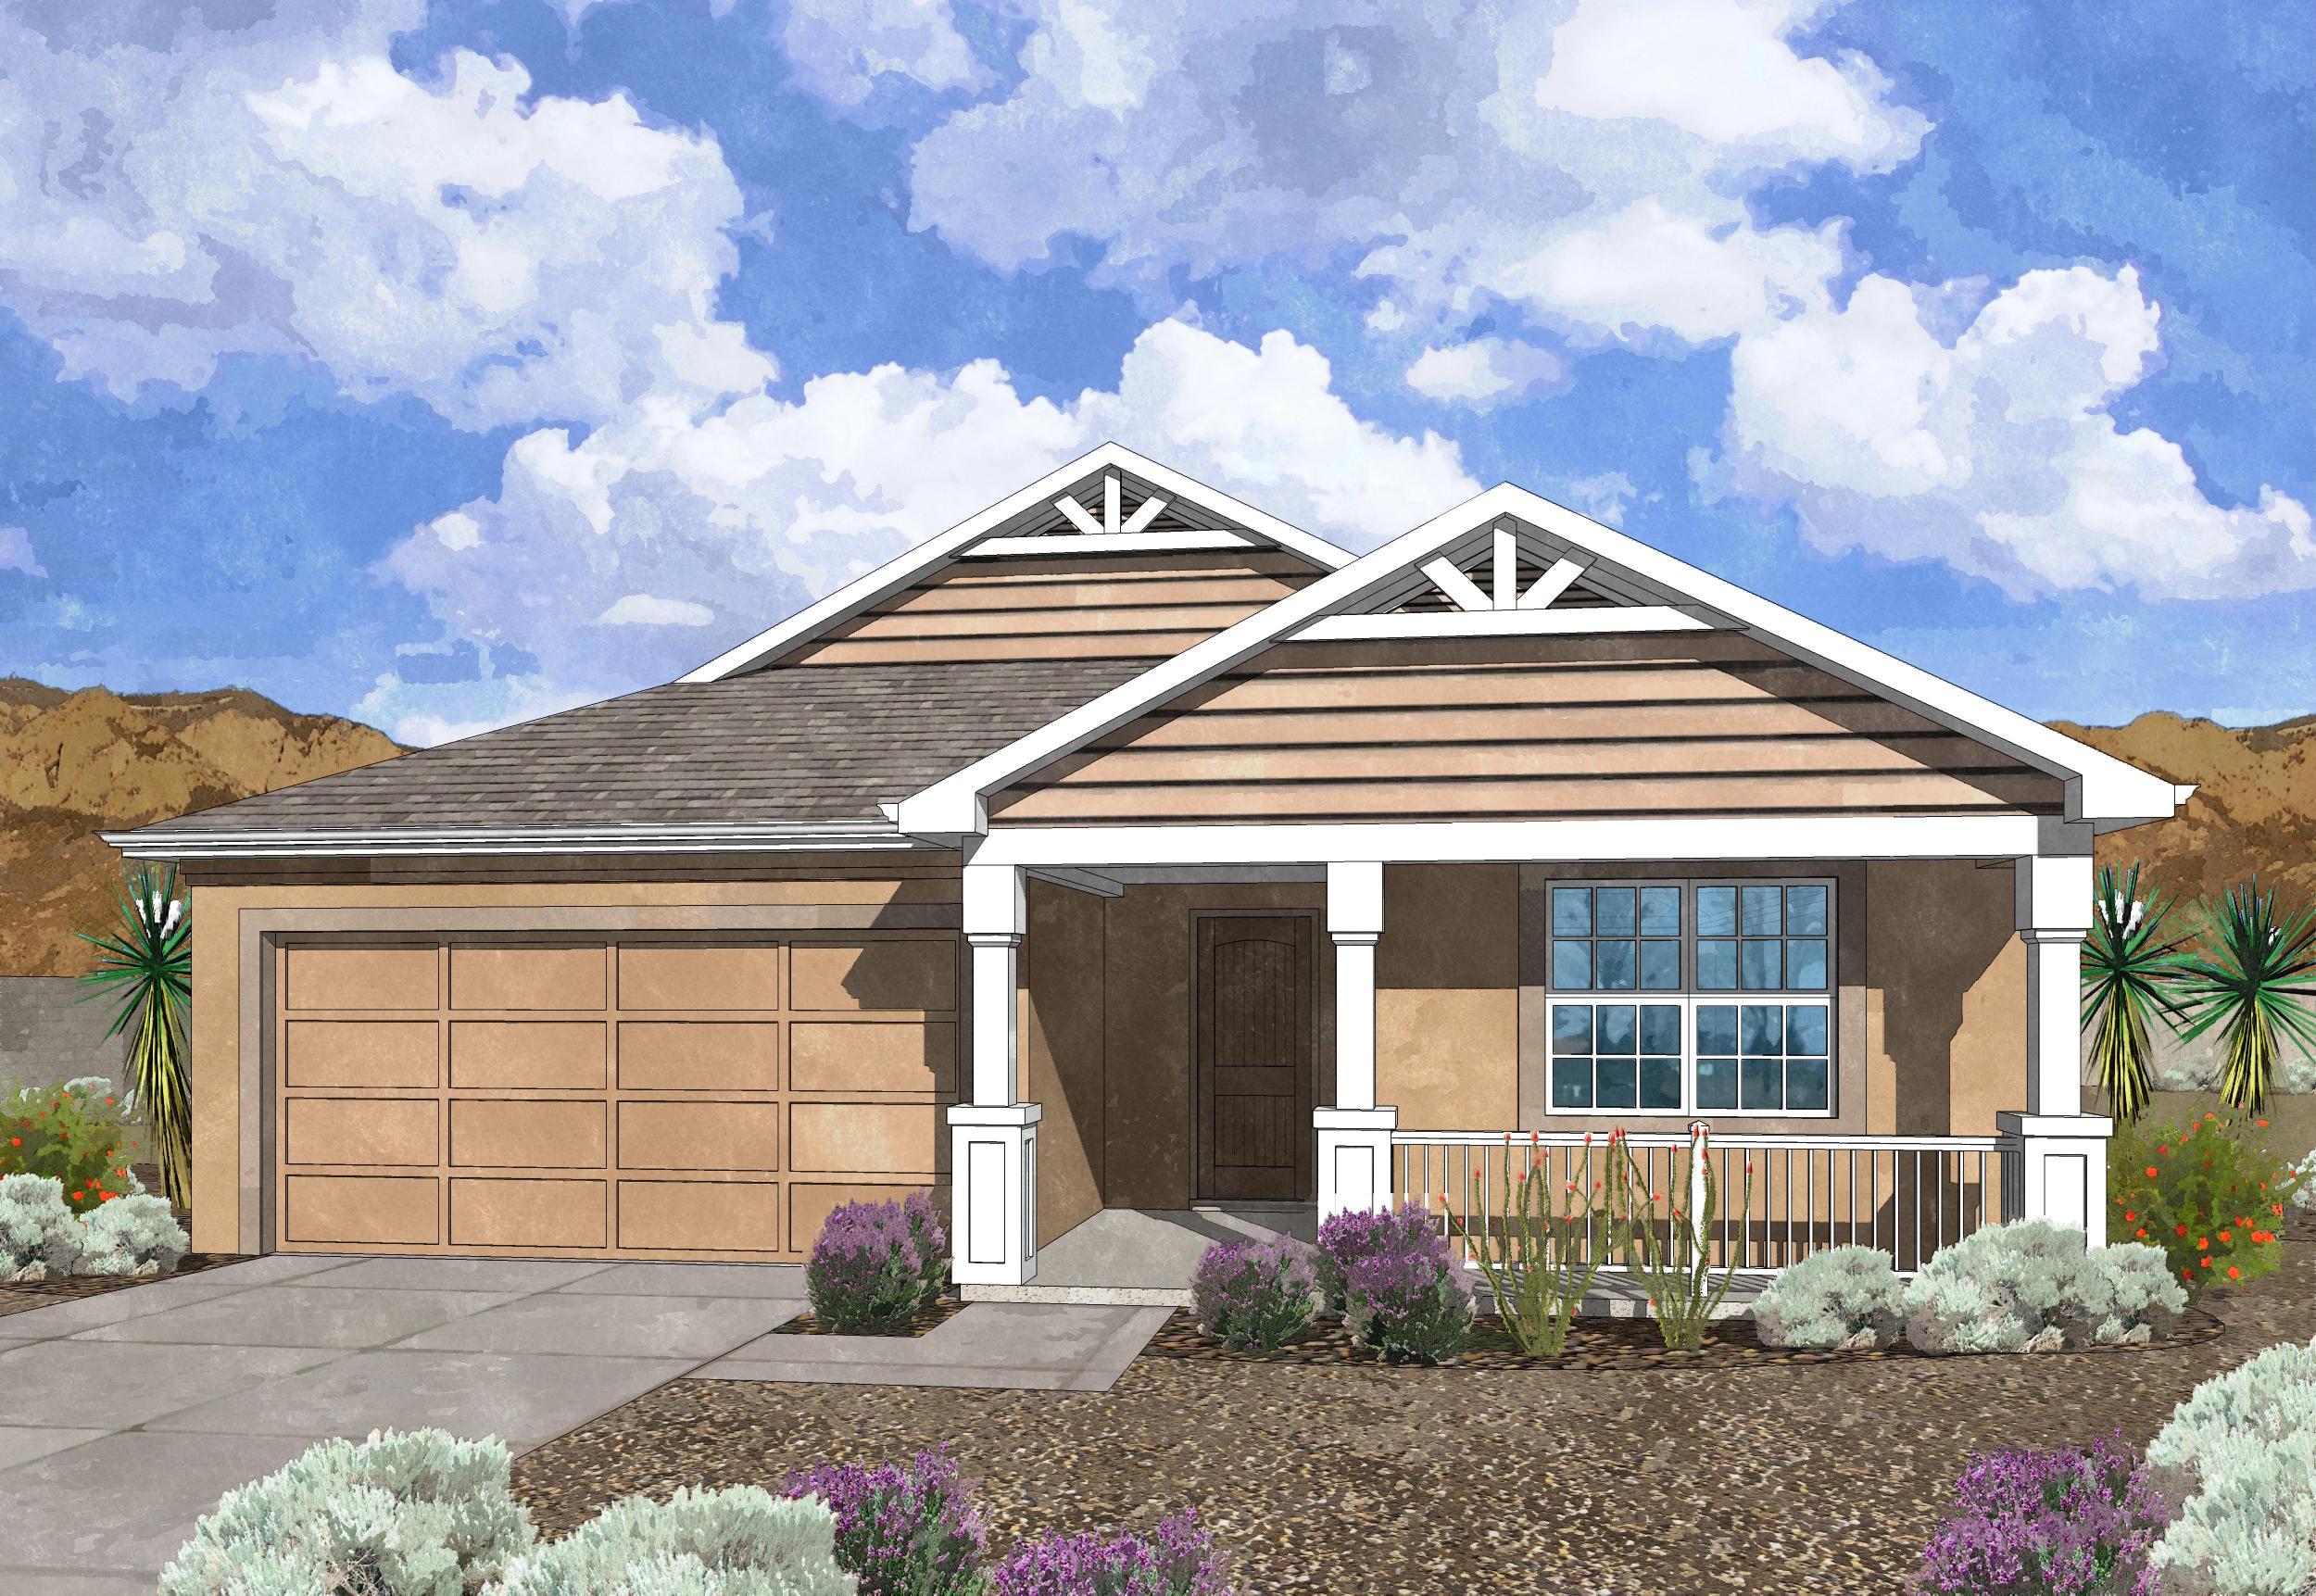 2324 Isabella Lane, Belen, NM 87002 - Belen, NM real estate listing